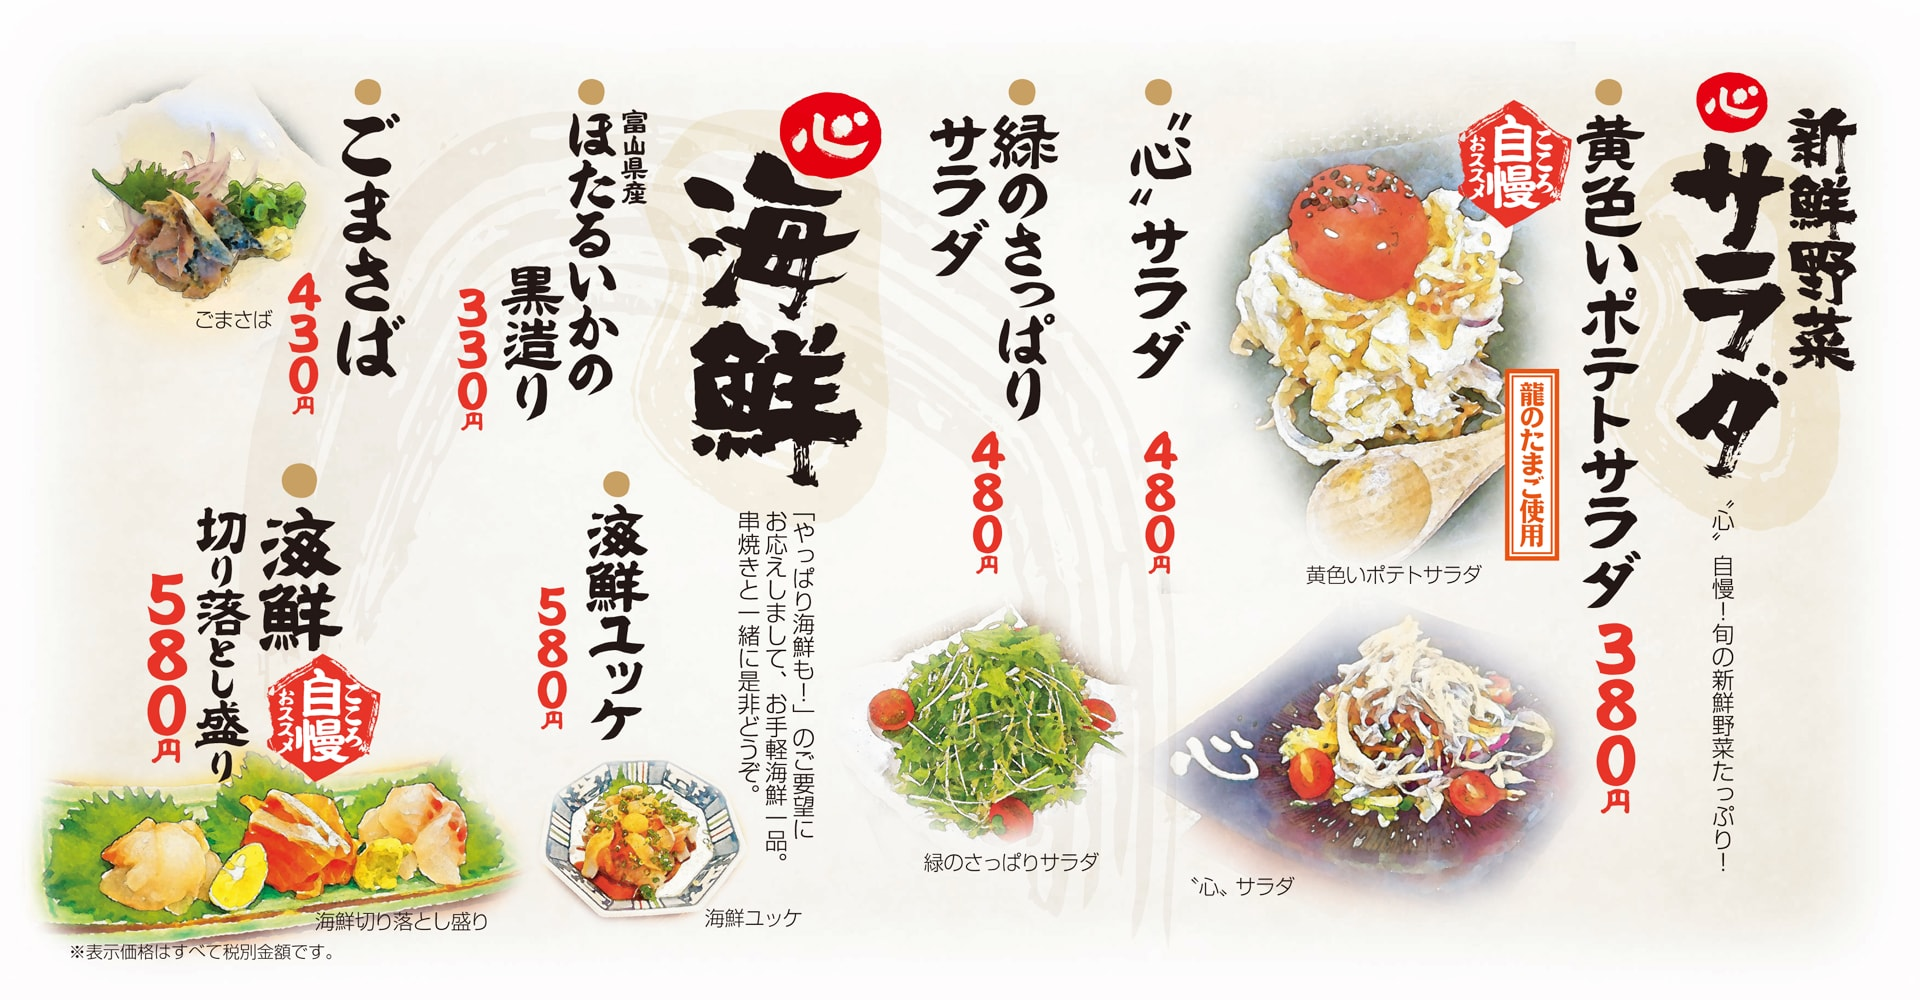 心八剣伝 新鮮野菜サラダ・海鮮